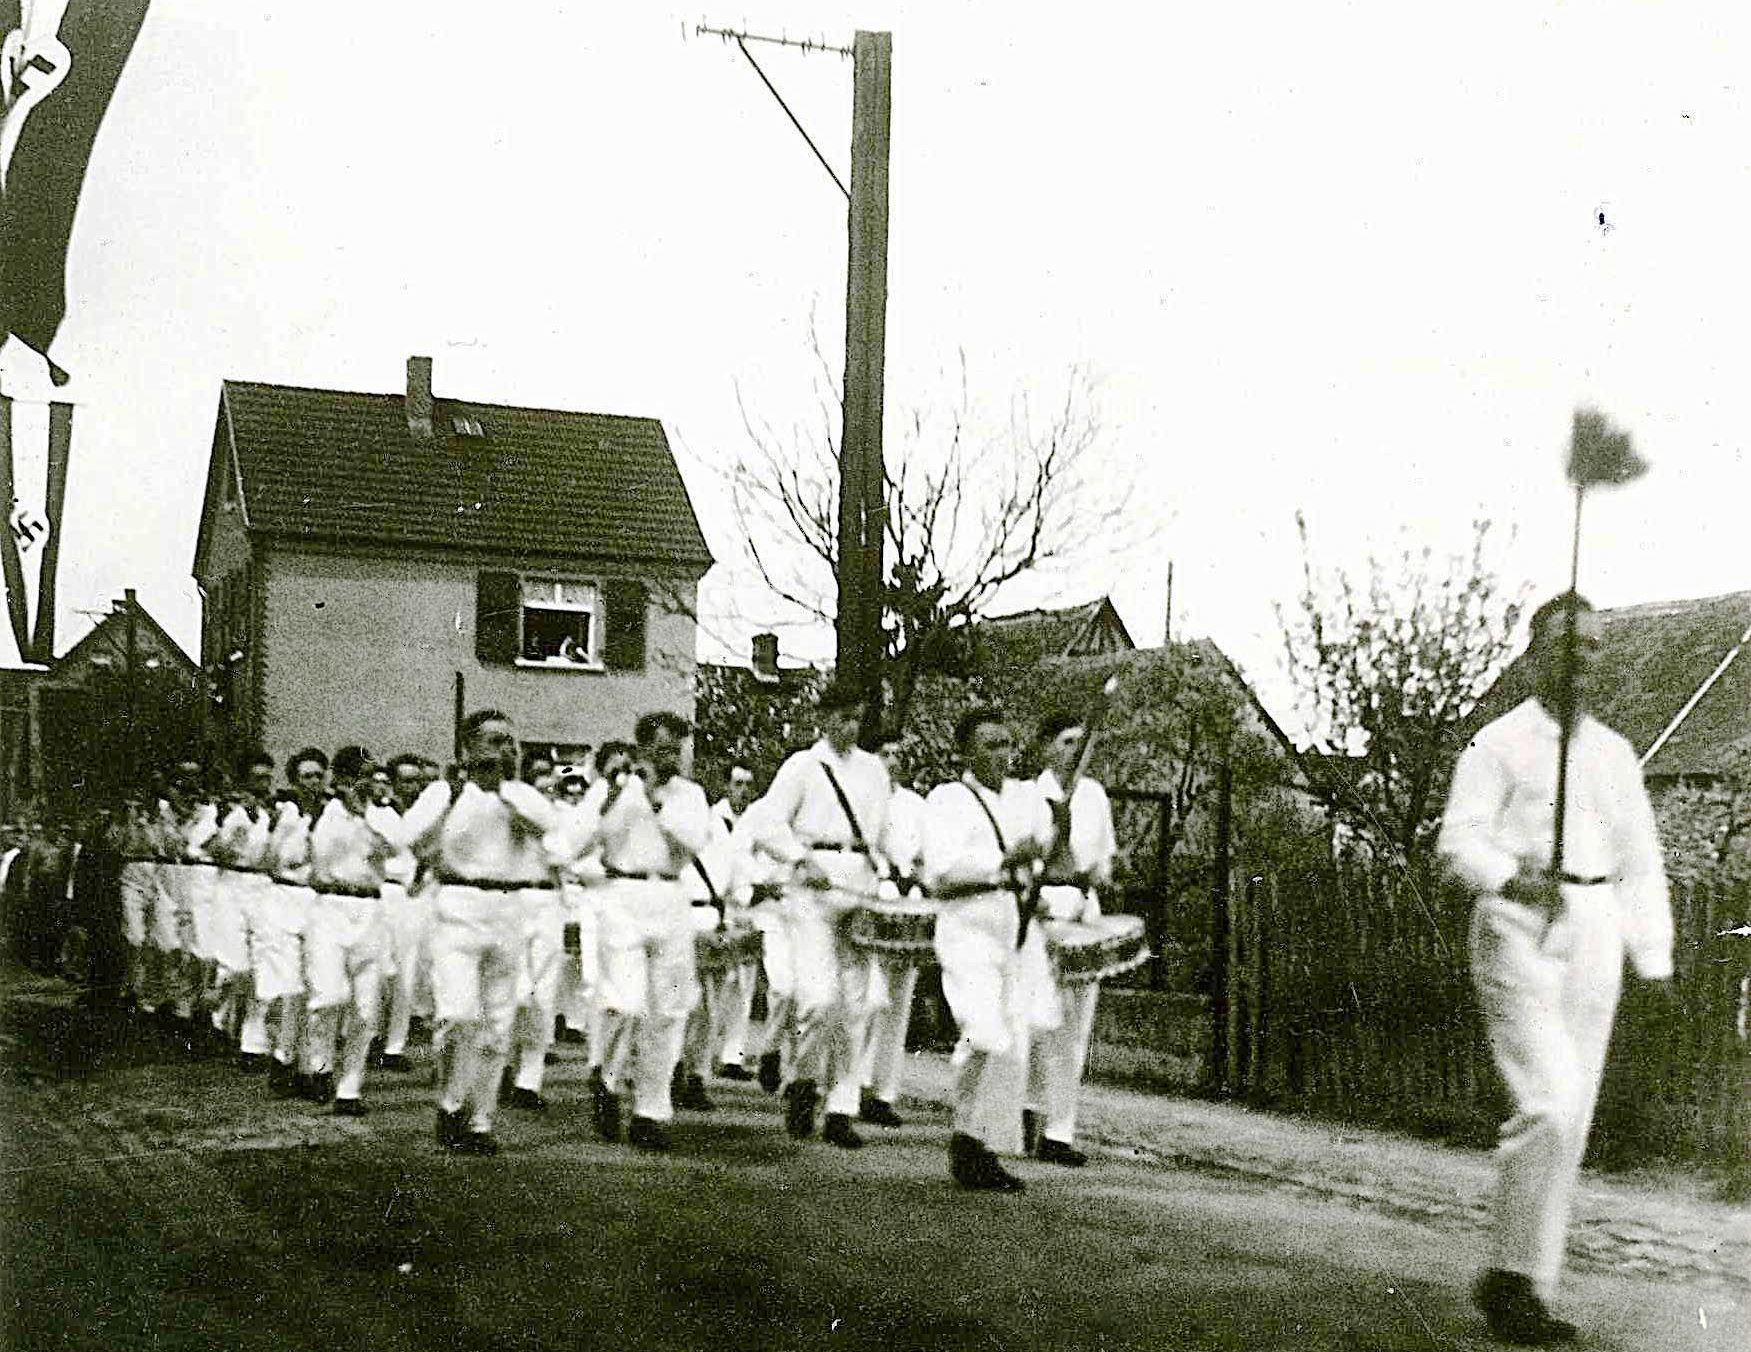 Freie Turner am 1. Mai 1933